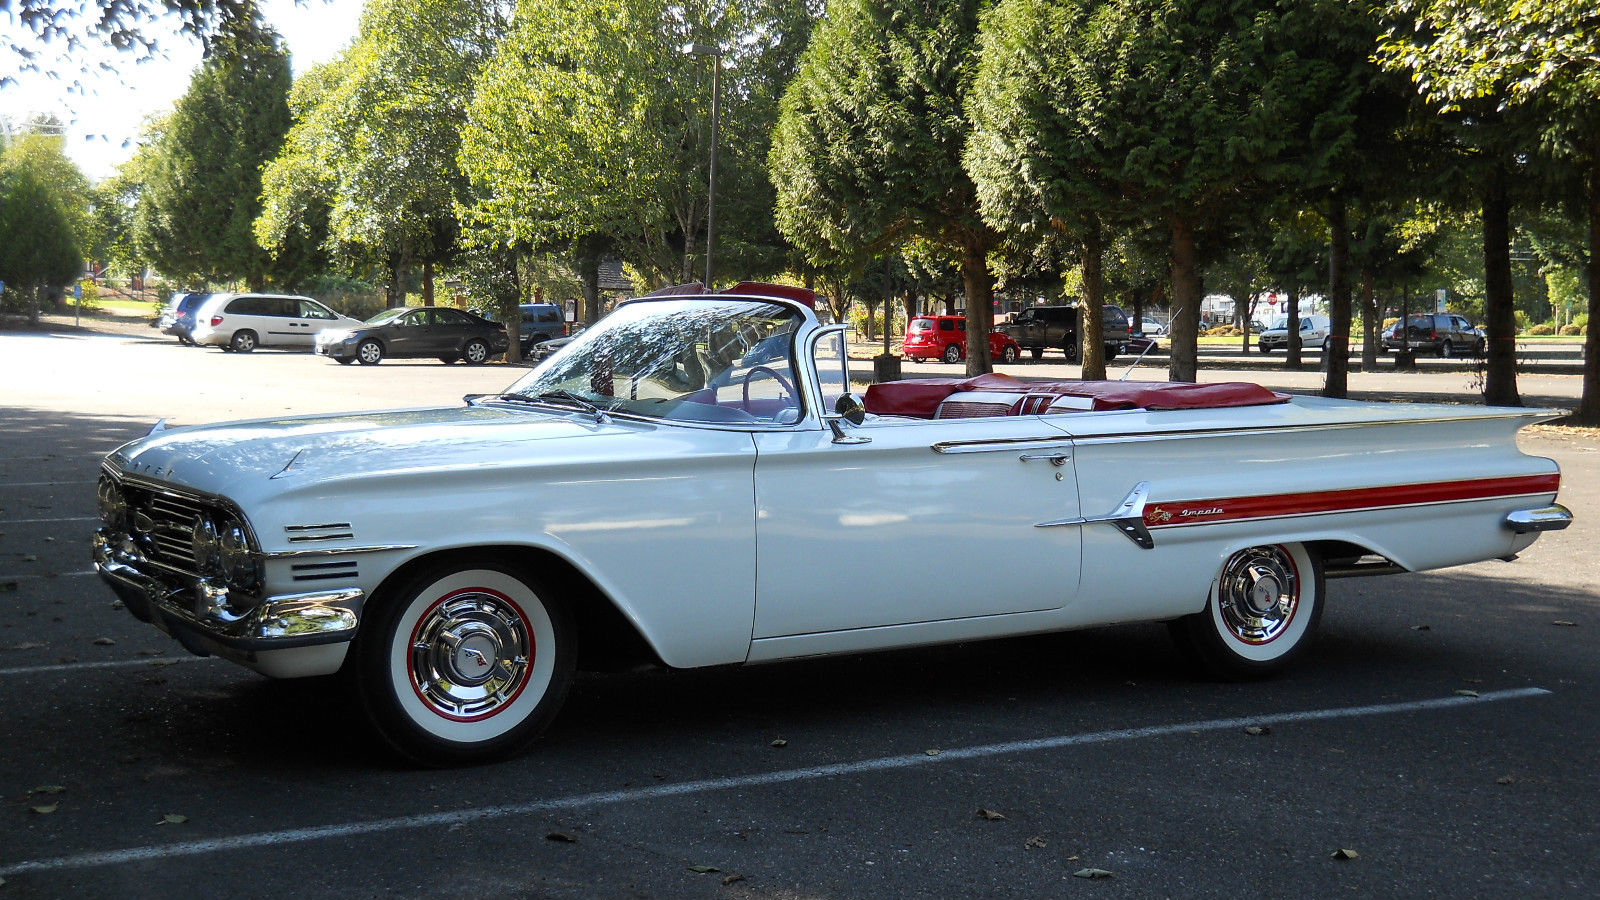 1960 chevrolet impala convertible 55 700 original miles matching 39 s car classic chevrolet. Black Bedroom Furniture Sets. Home Design Ideas